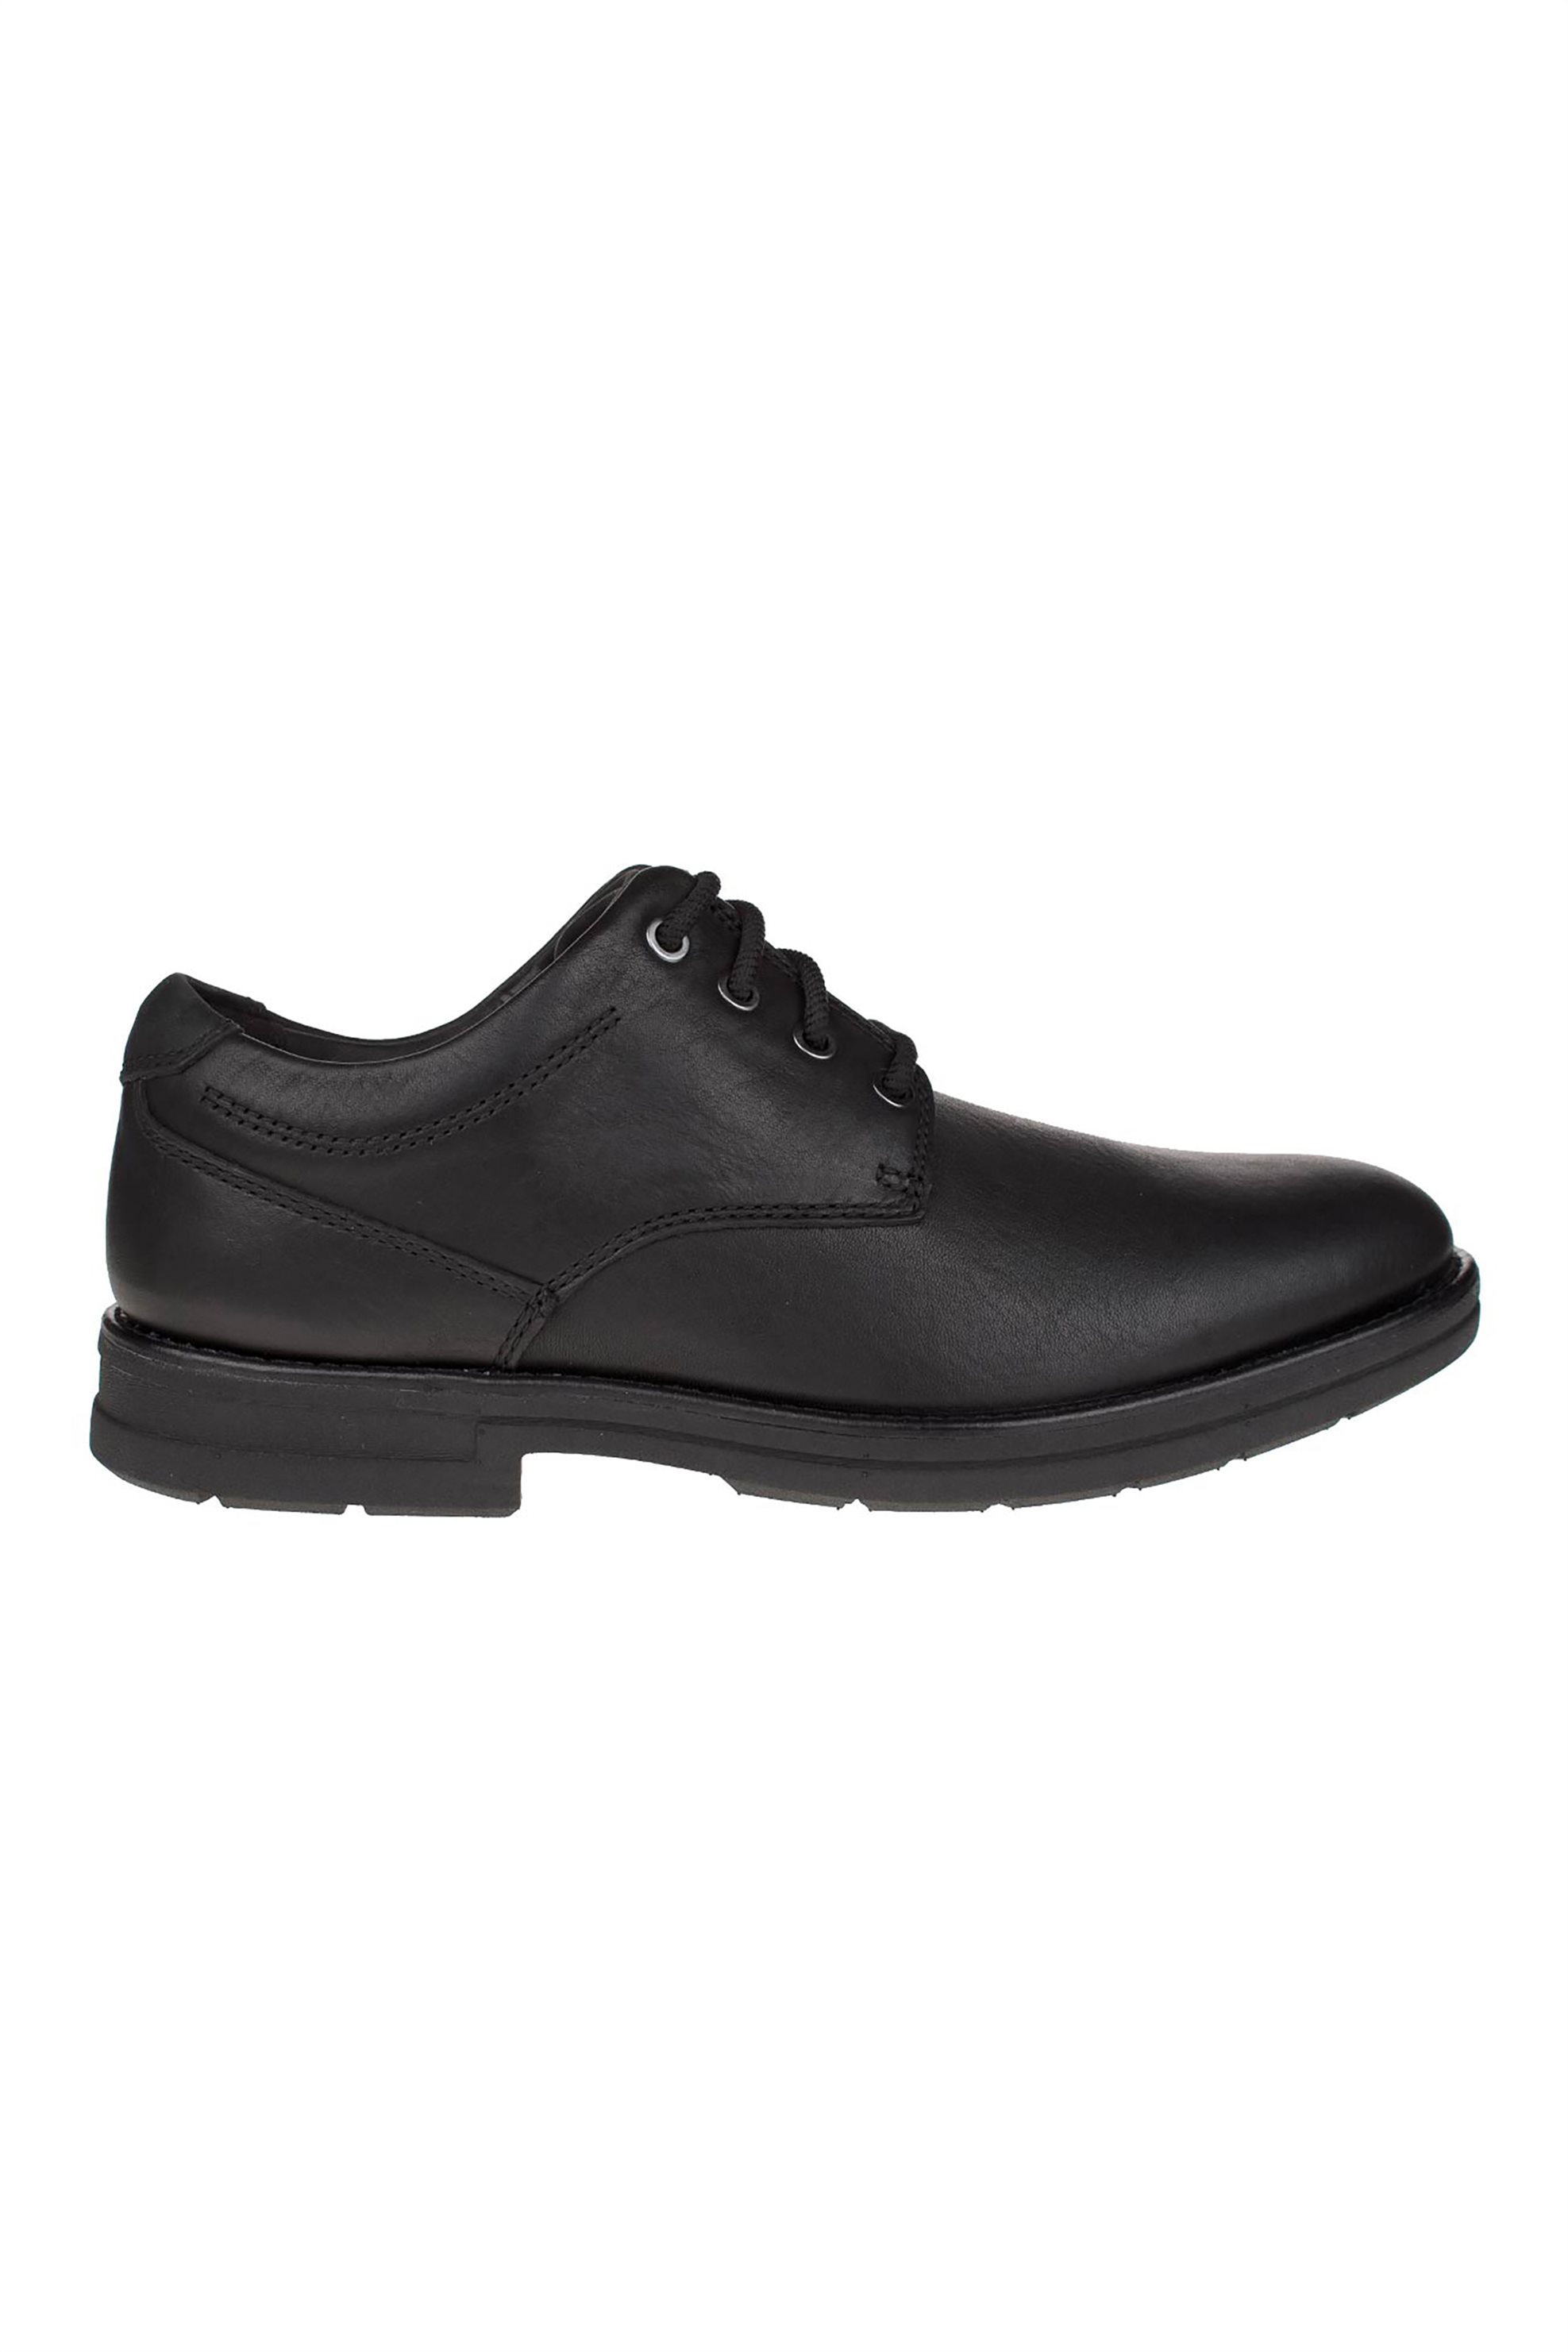 "Clarks ανδρικά παπούτσια oxford ""Banning plain"" – 26151753 – Μαύρο"